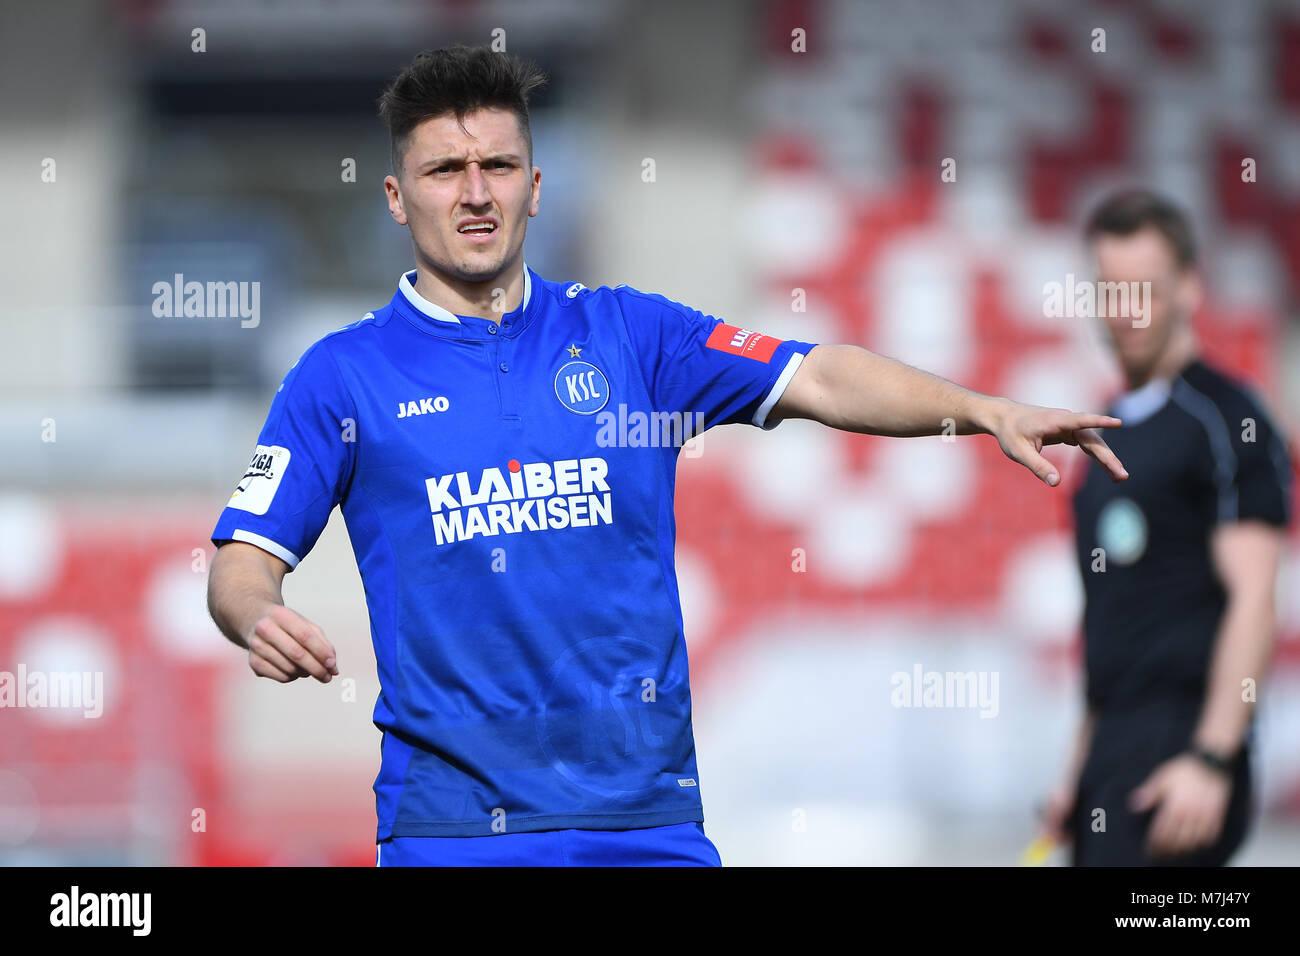 Erfurt, Deutschland. 11th Mar, 2018. Marcel Mehlem (KSC). GES/ Fussball/ 3. Liga: RW Erfurt - Karlsruher SC, 11.03.2018 - Stock Image